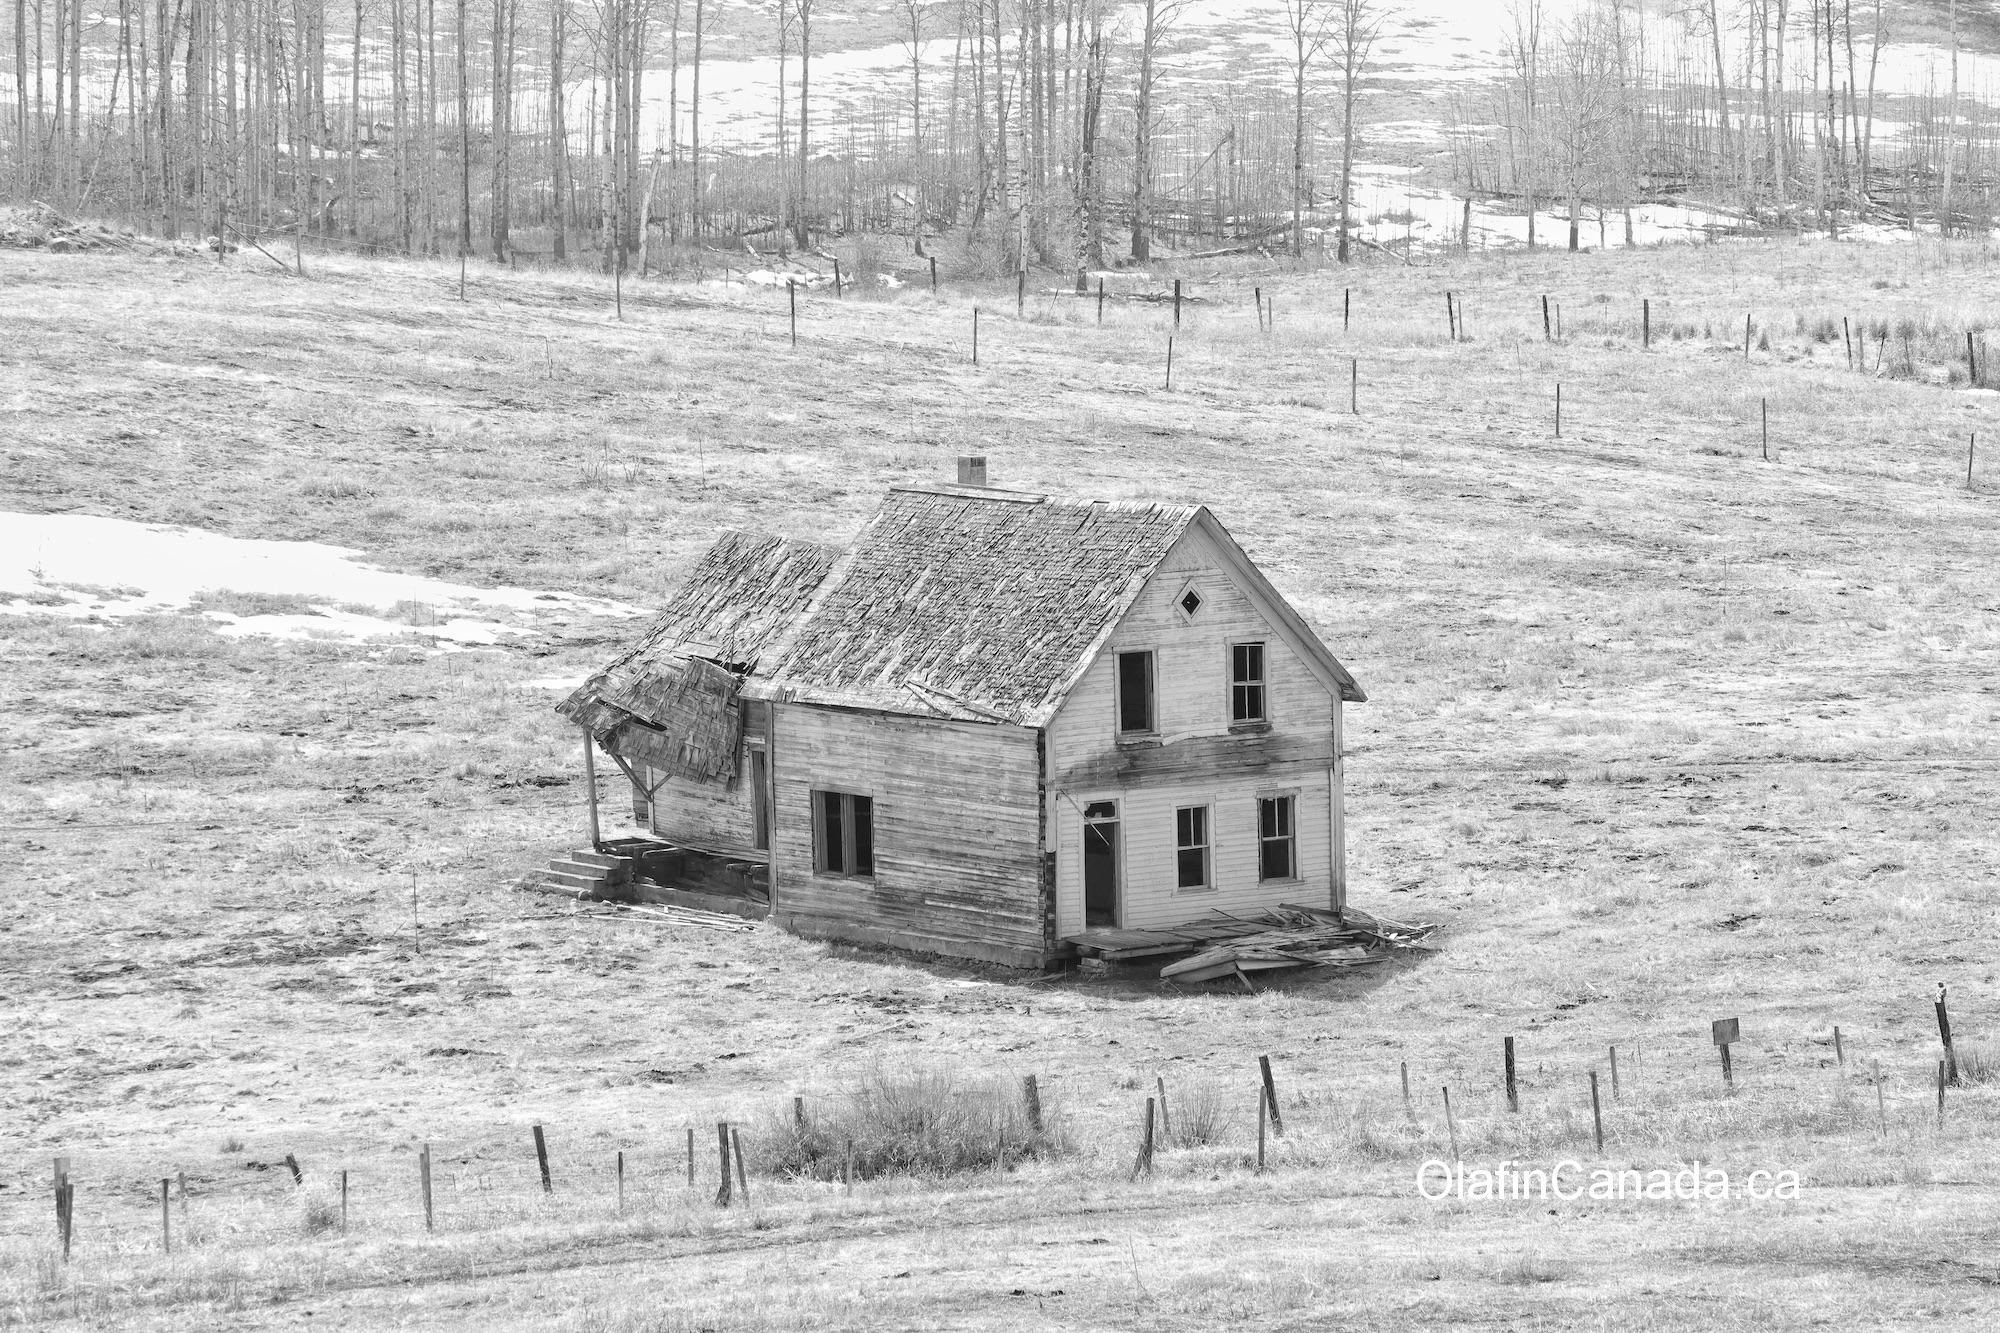 Lawless Ranch in Bridesville, along highway 3 #olafincanada #britishcolumbia #discoverbc #abandonedbc #bridesville